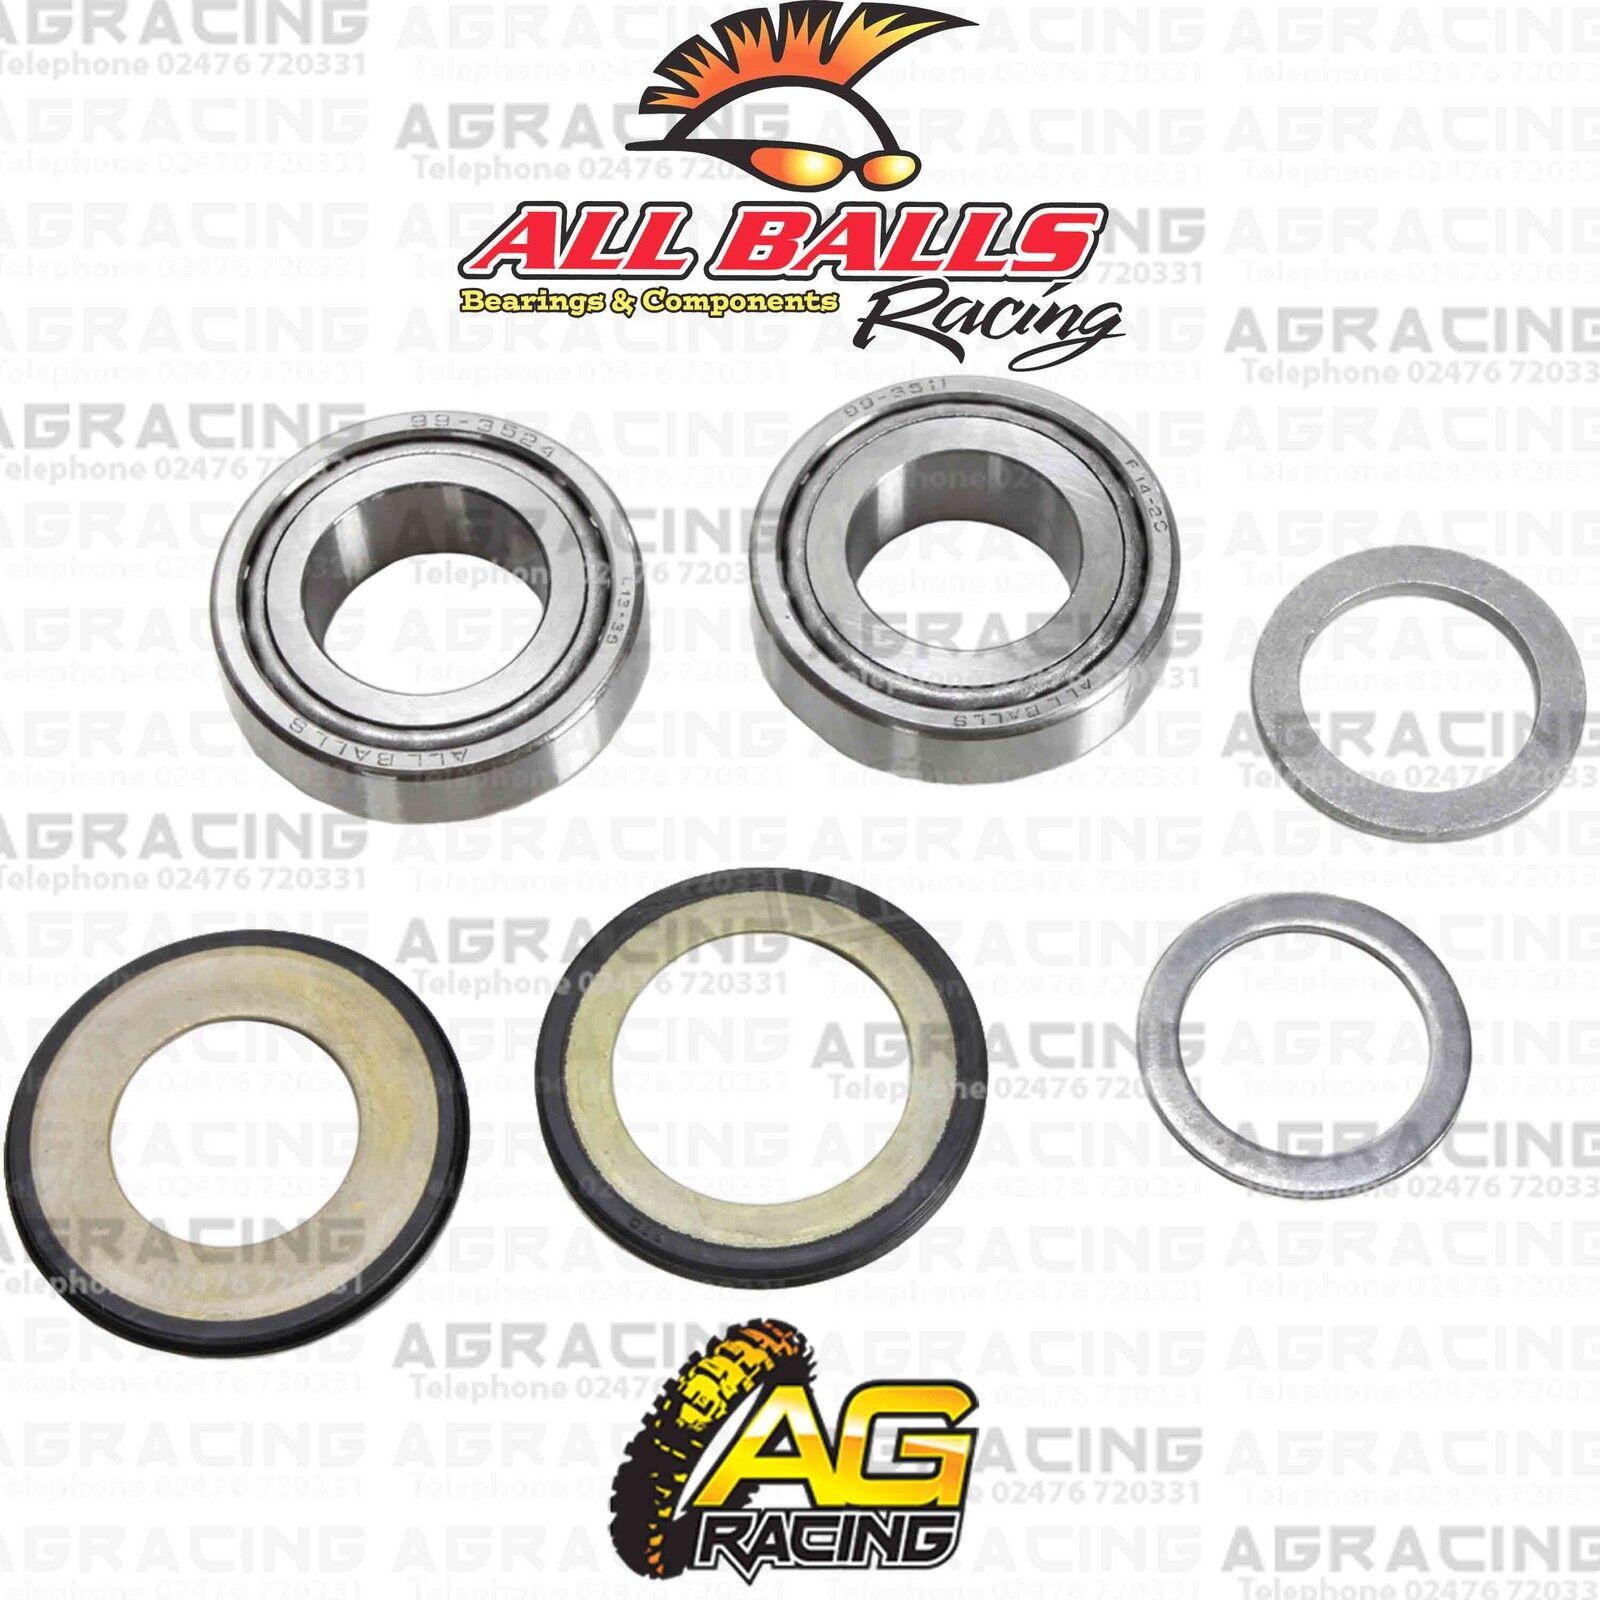 KTM EXC 125 2006-2008 Tapered Steering Head Stock Stem Bearing Kit /& Seals